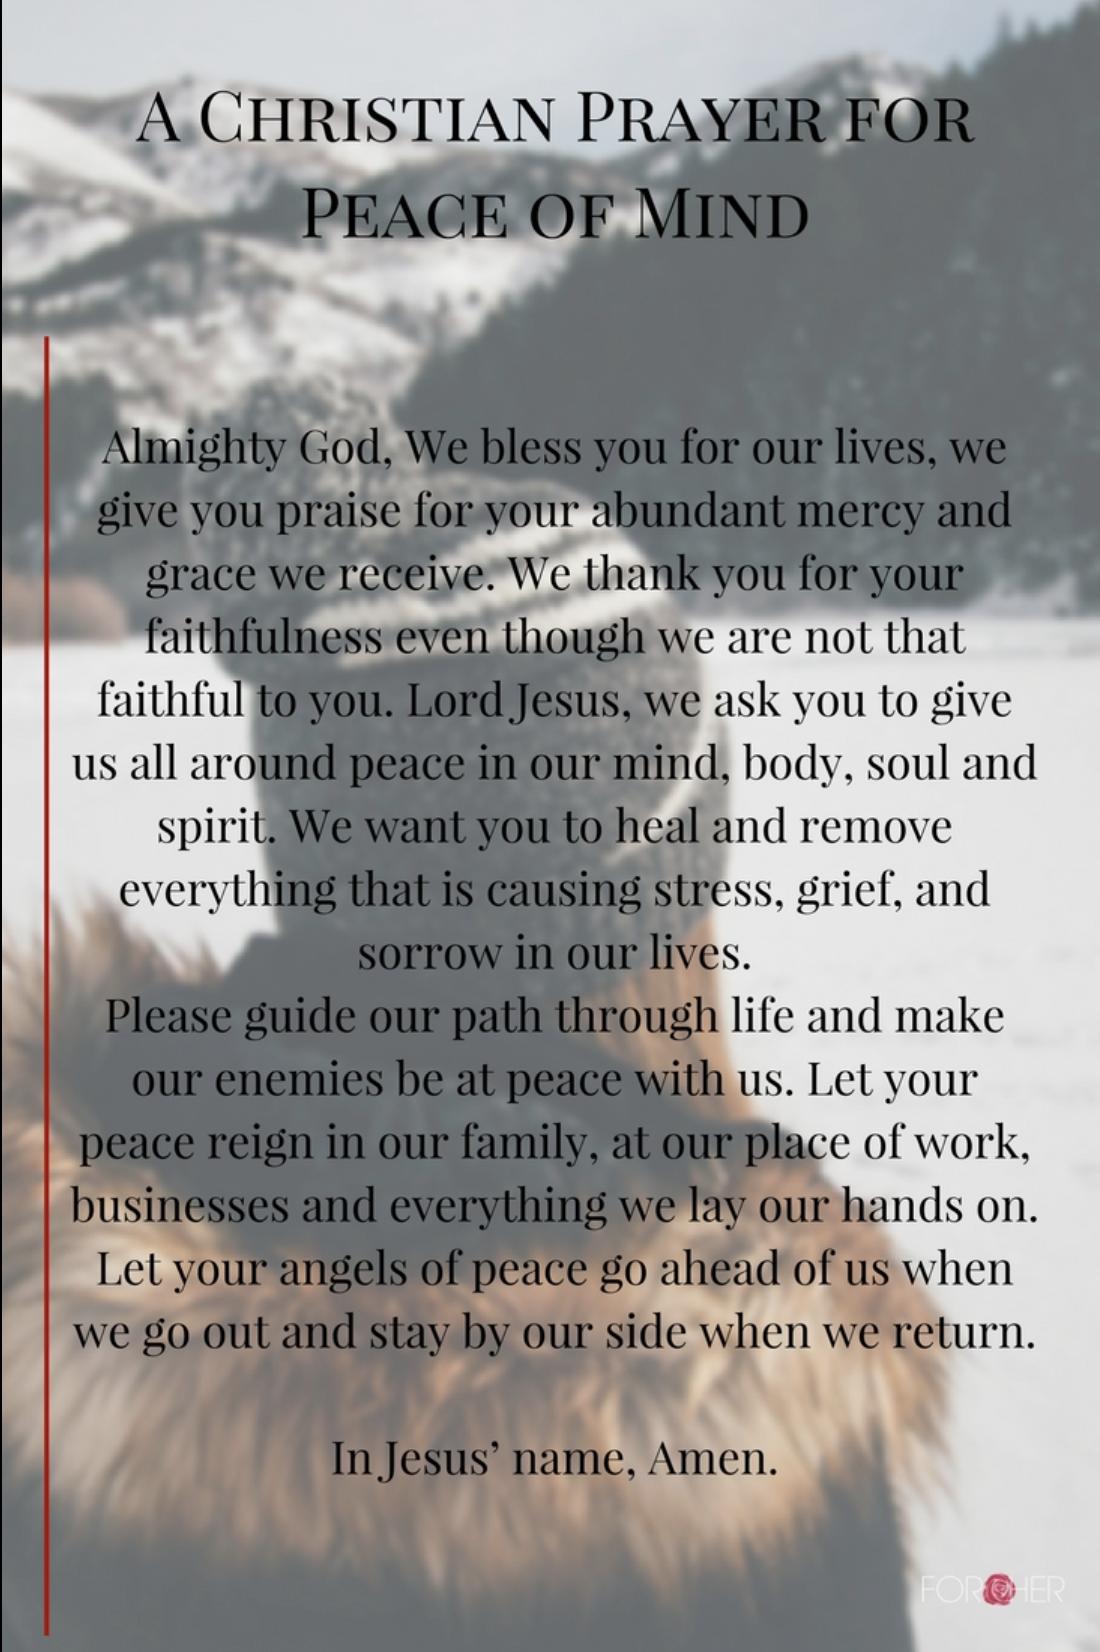 CHRISTIN PRAYER FOR PEACE OF MIND